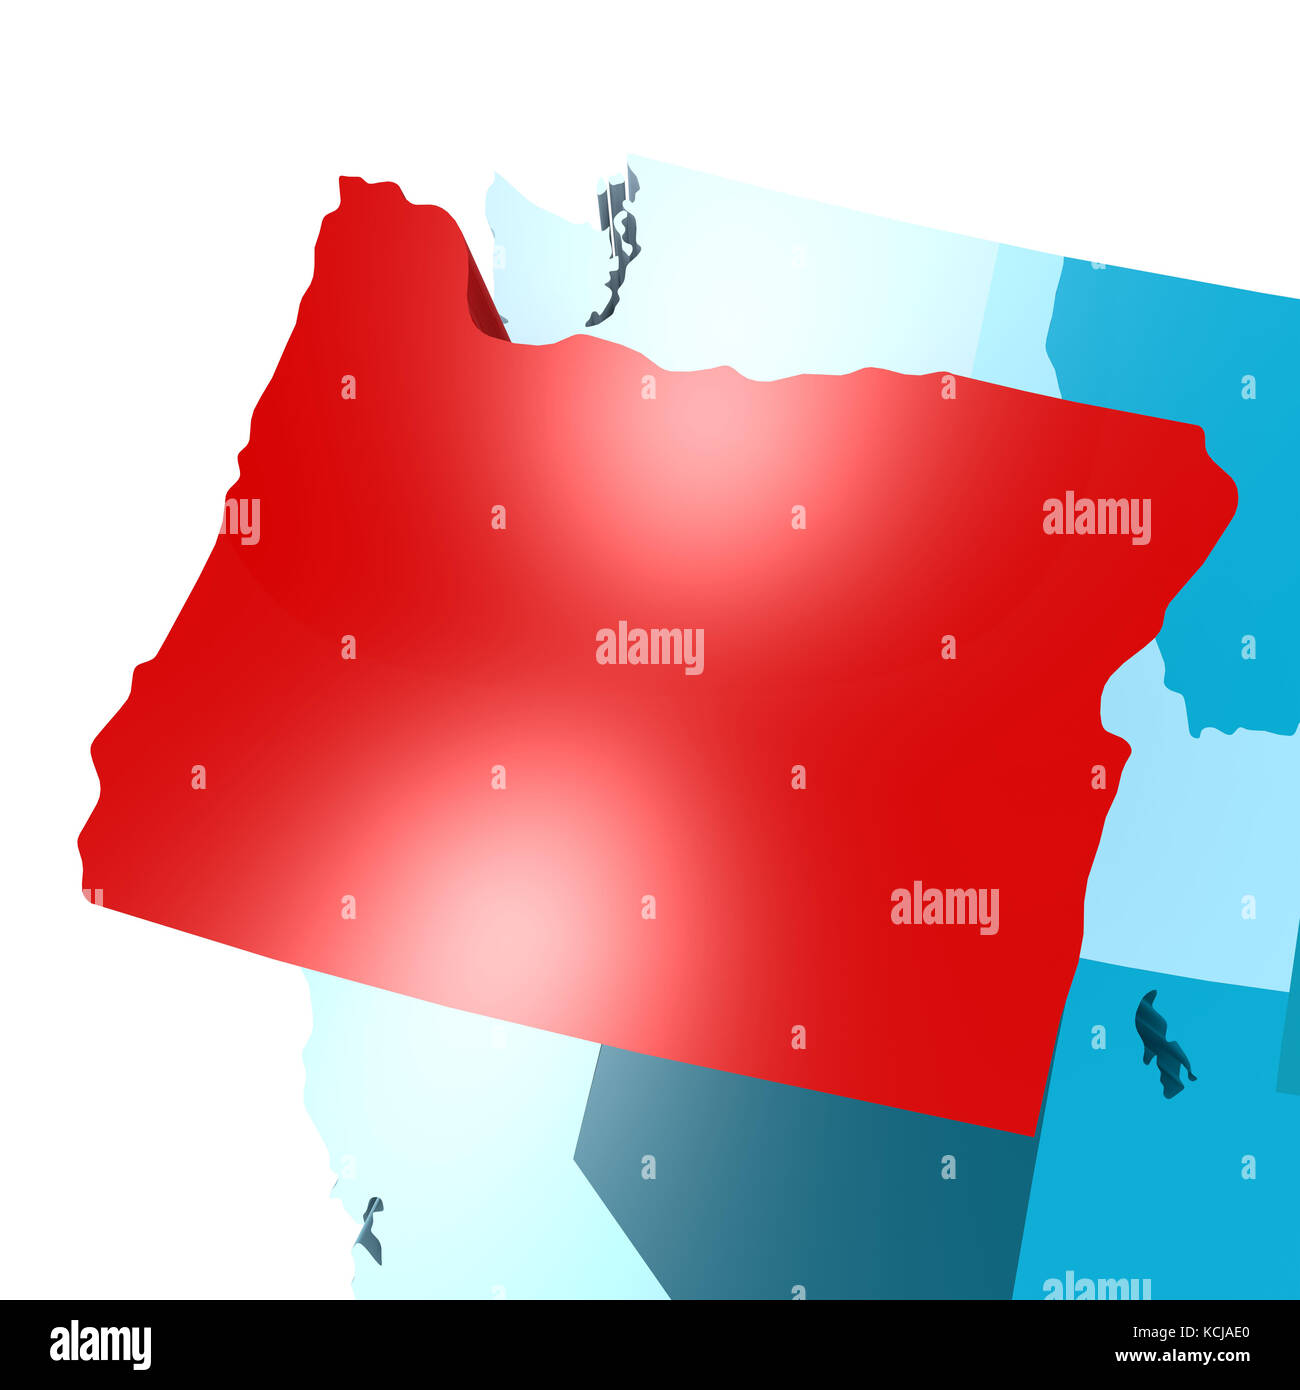 Oregon Map Stock Photos & Oregon Map Stock Images - Alamy